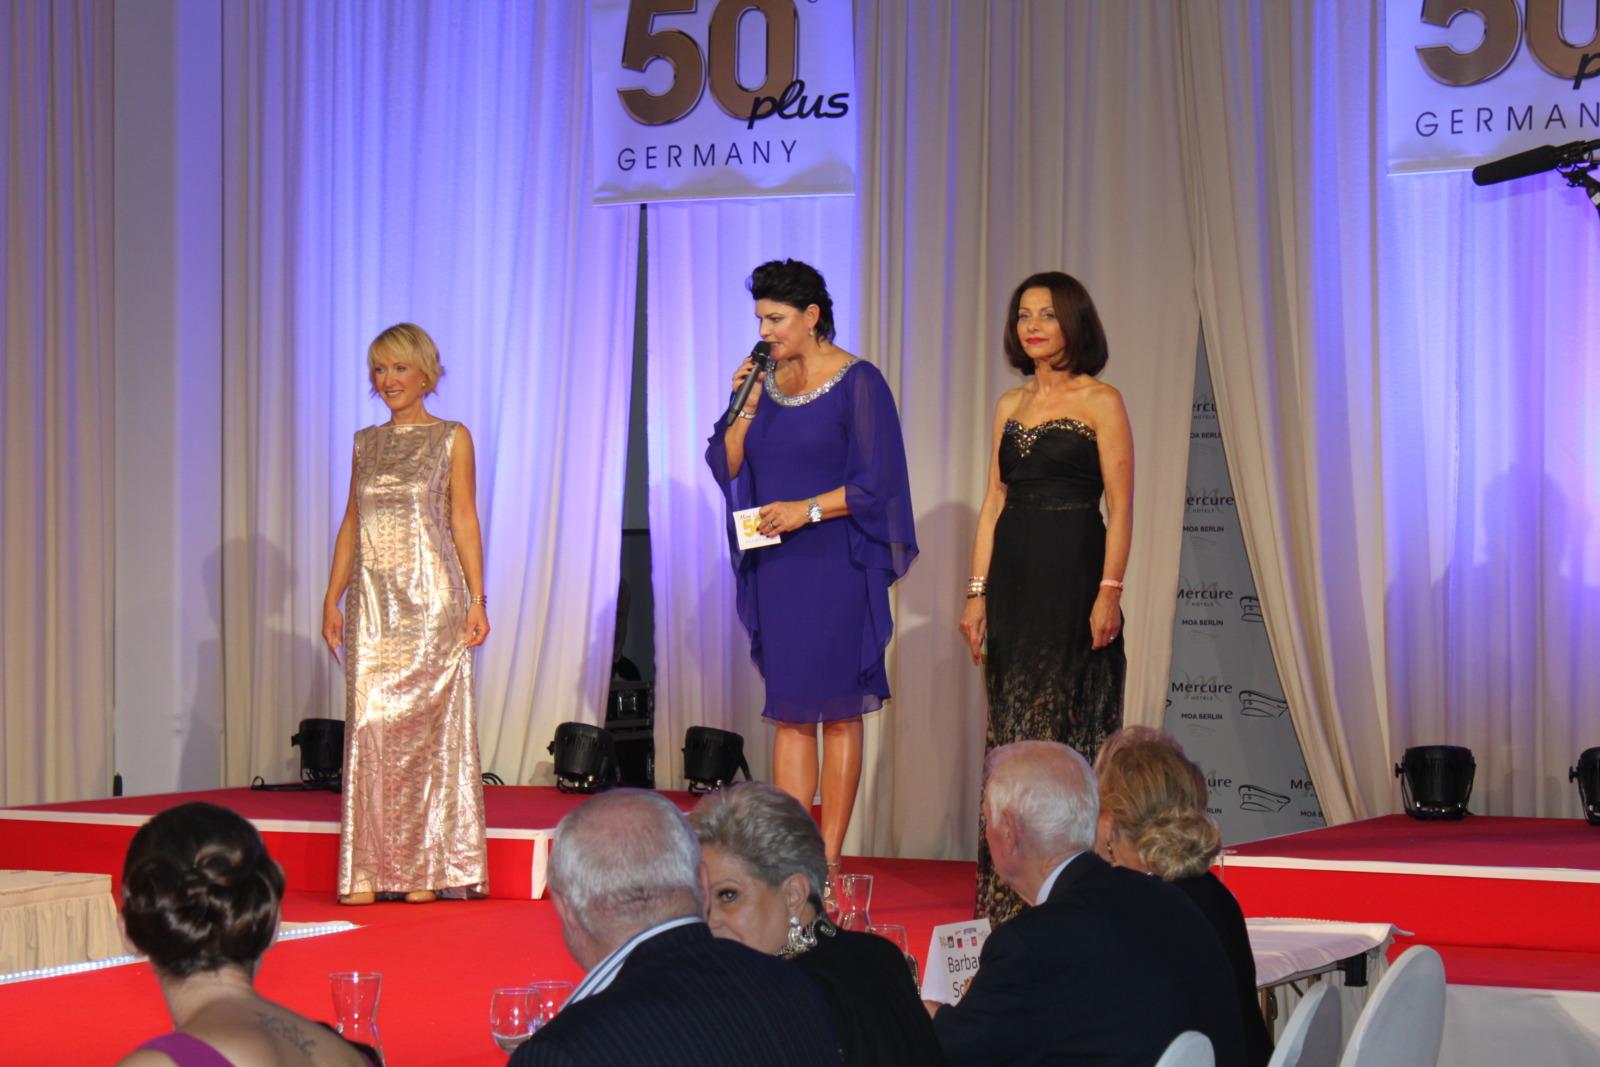 Miss 50 Germany